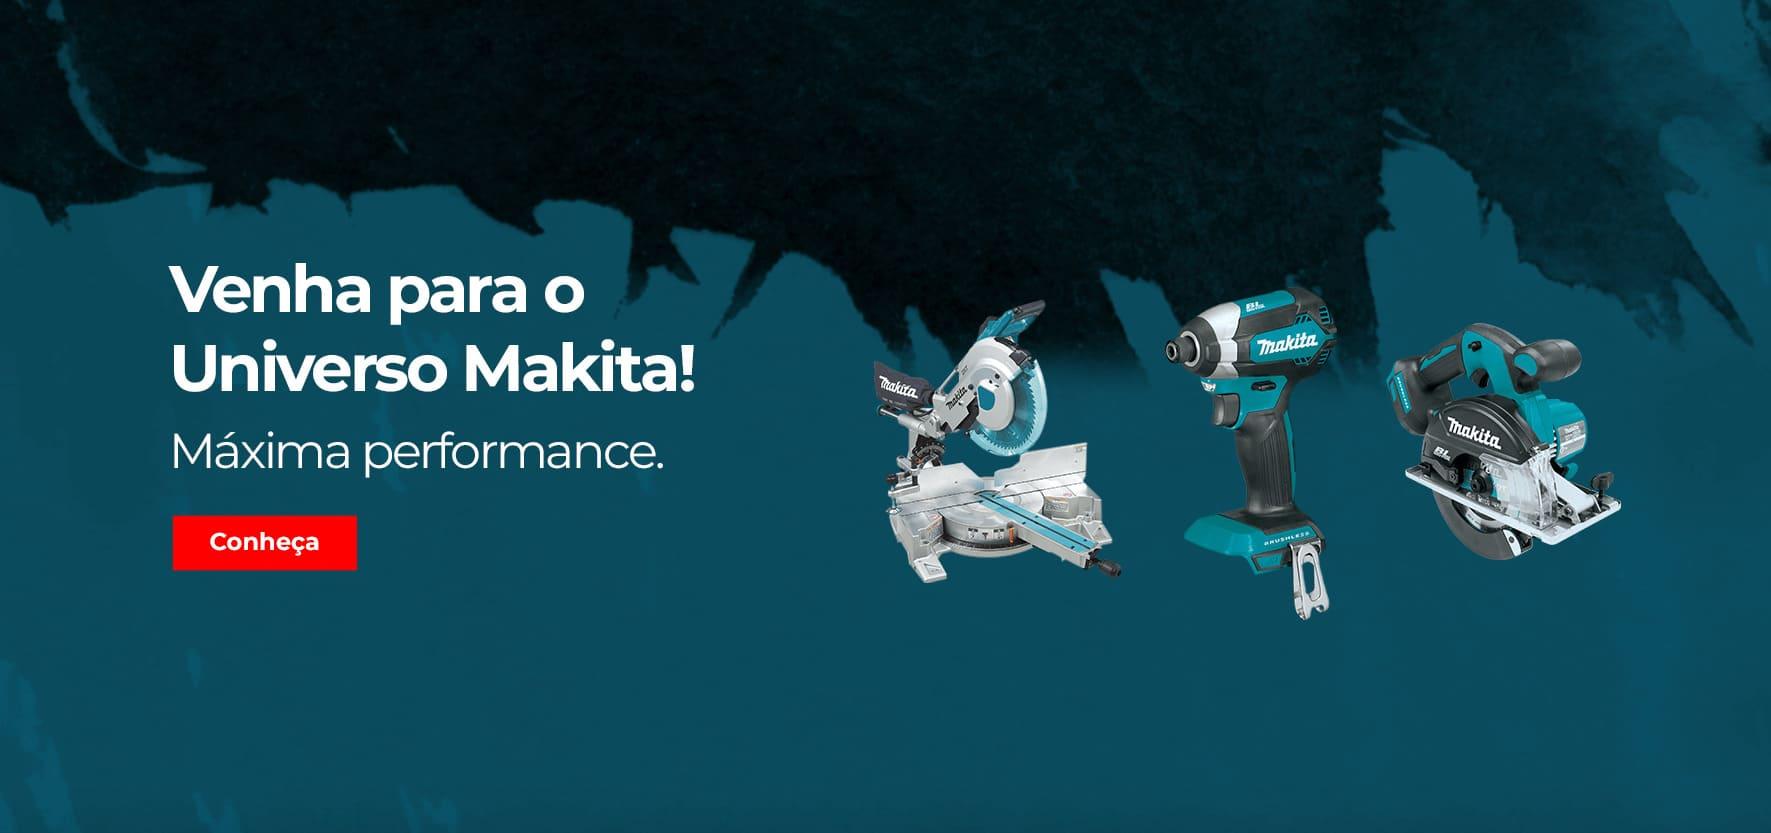 Venha para o universo Makita, máxima performance